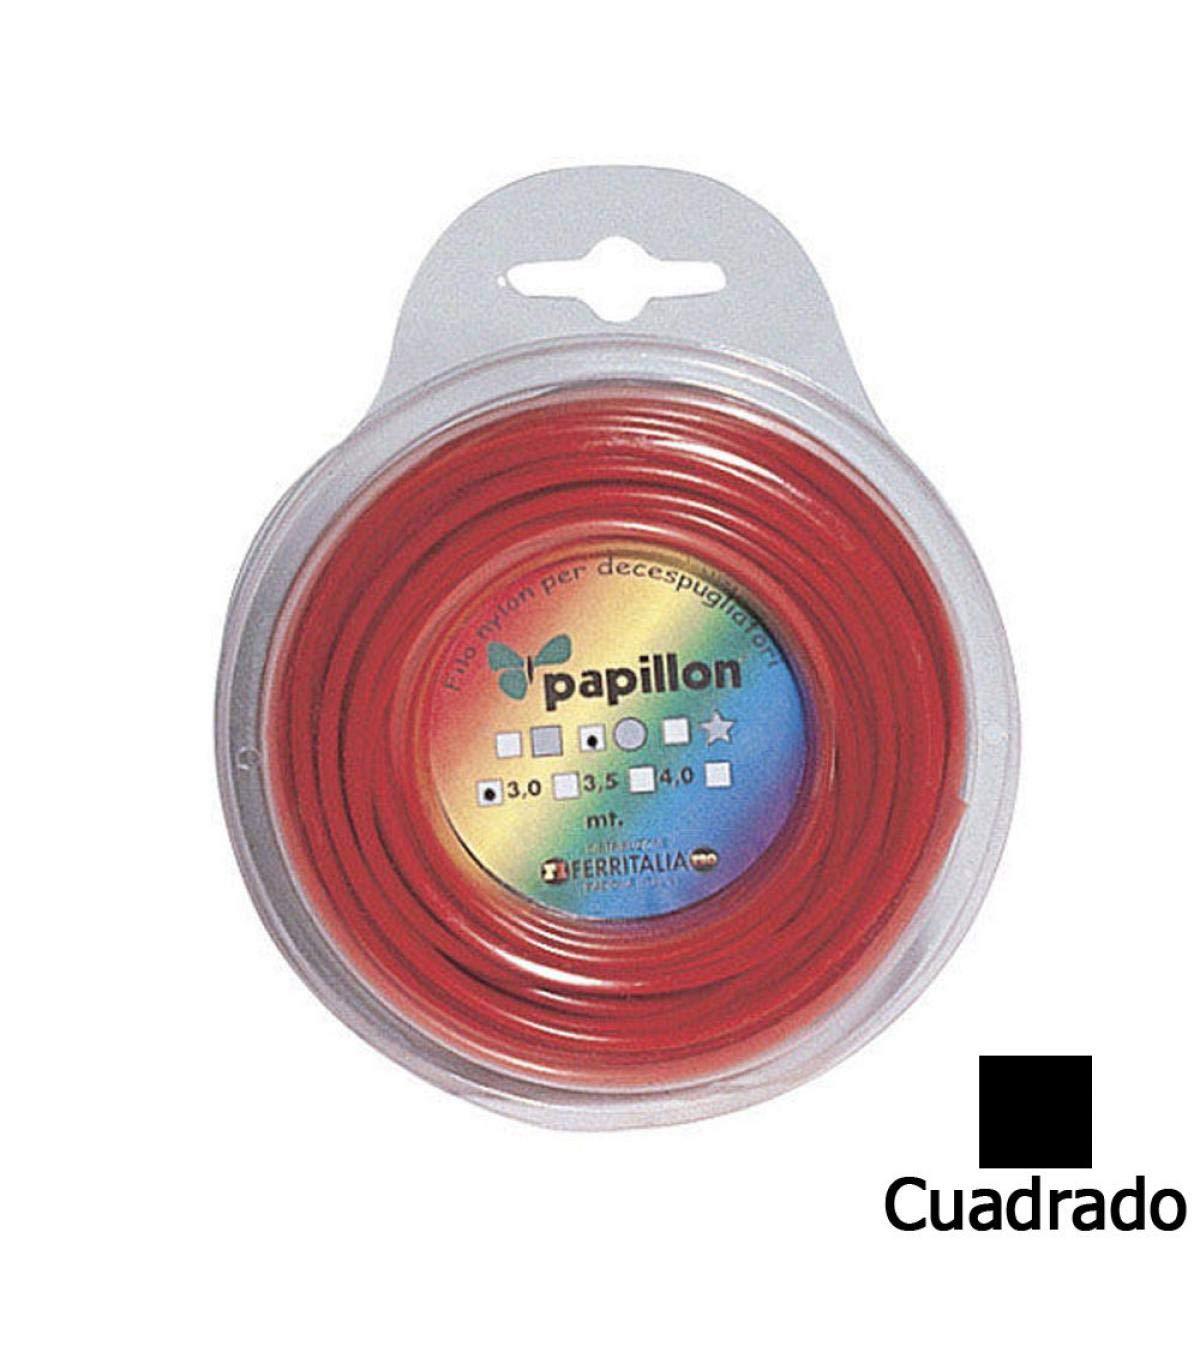 Papillon 8061820 Hilo Nylon Profesional Cuadrado: Amazon.es ...